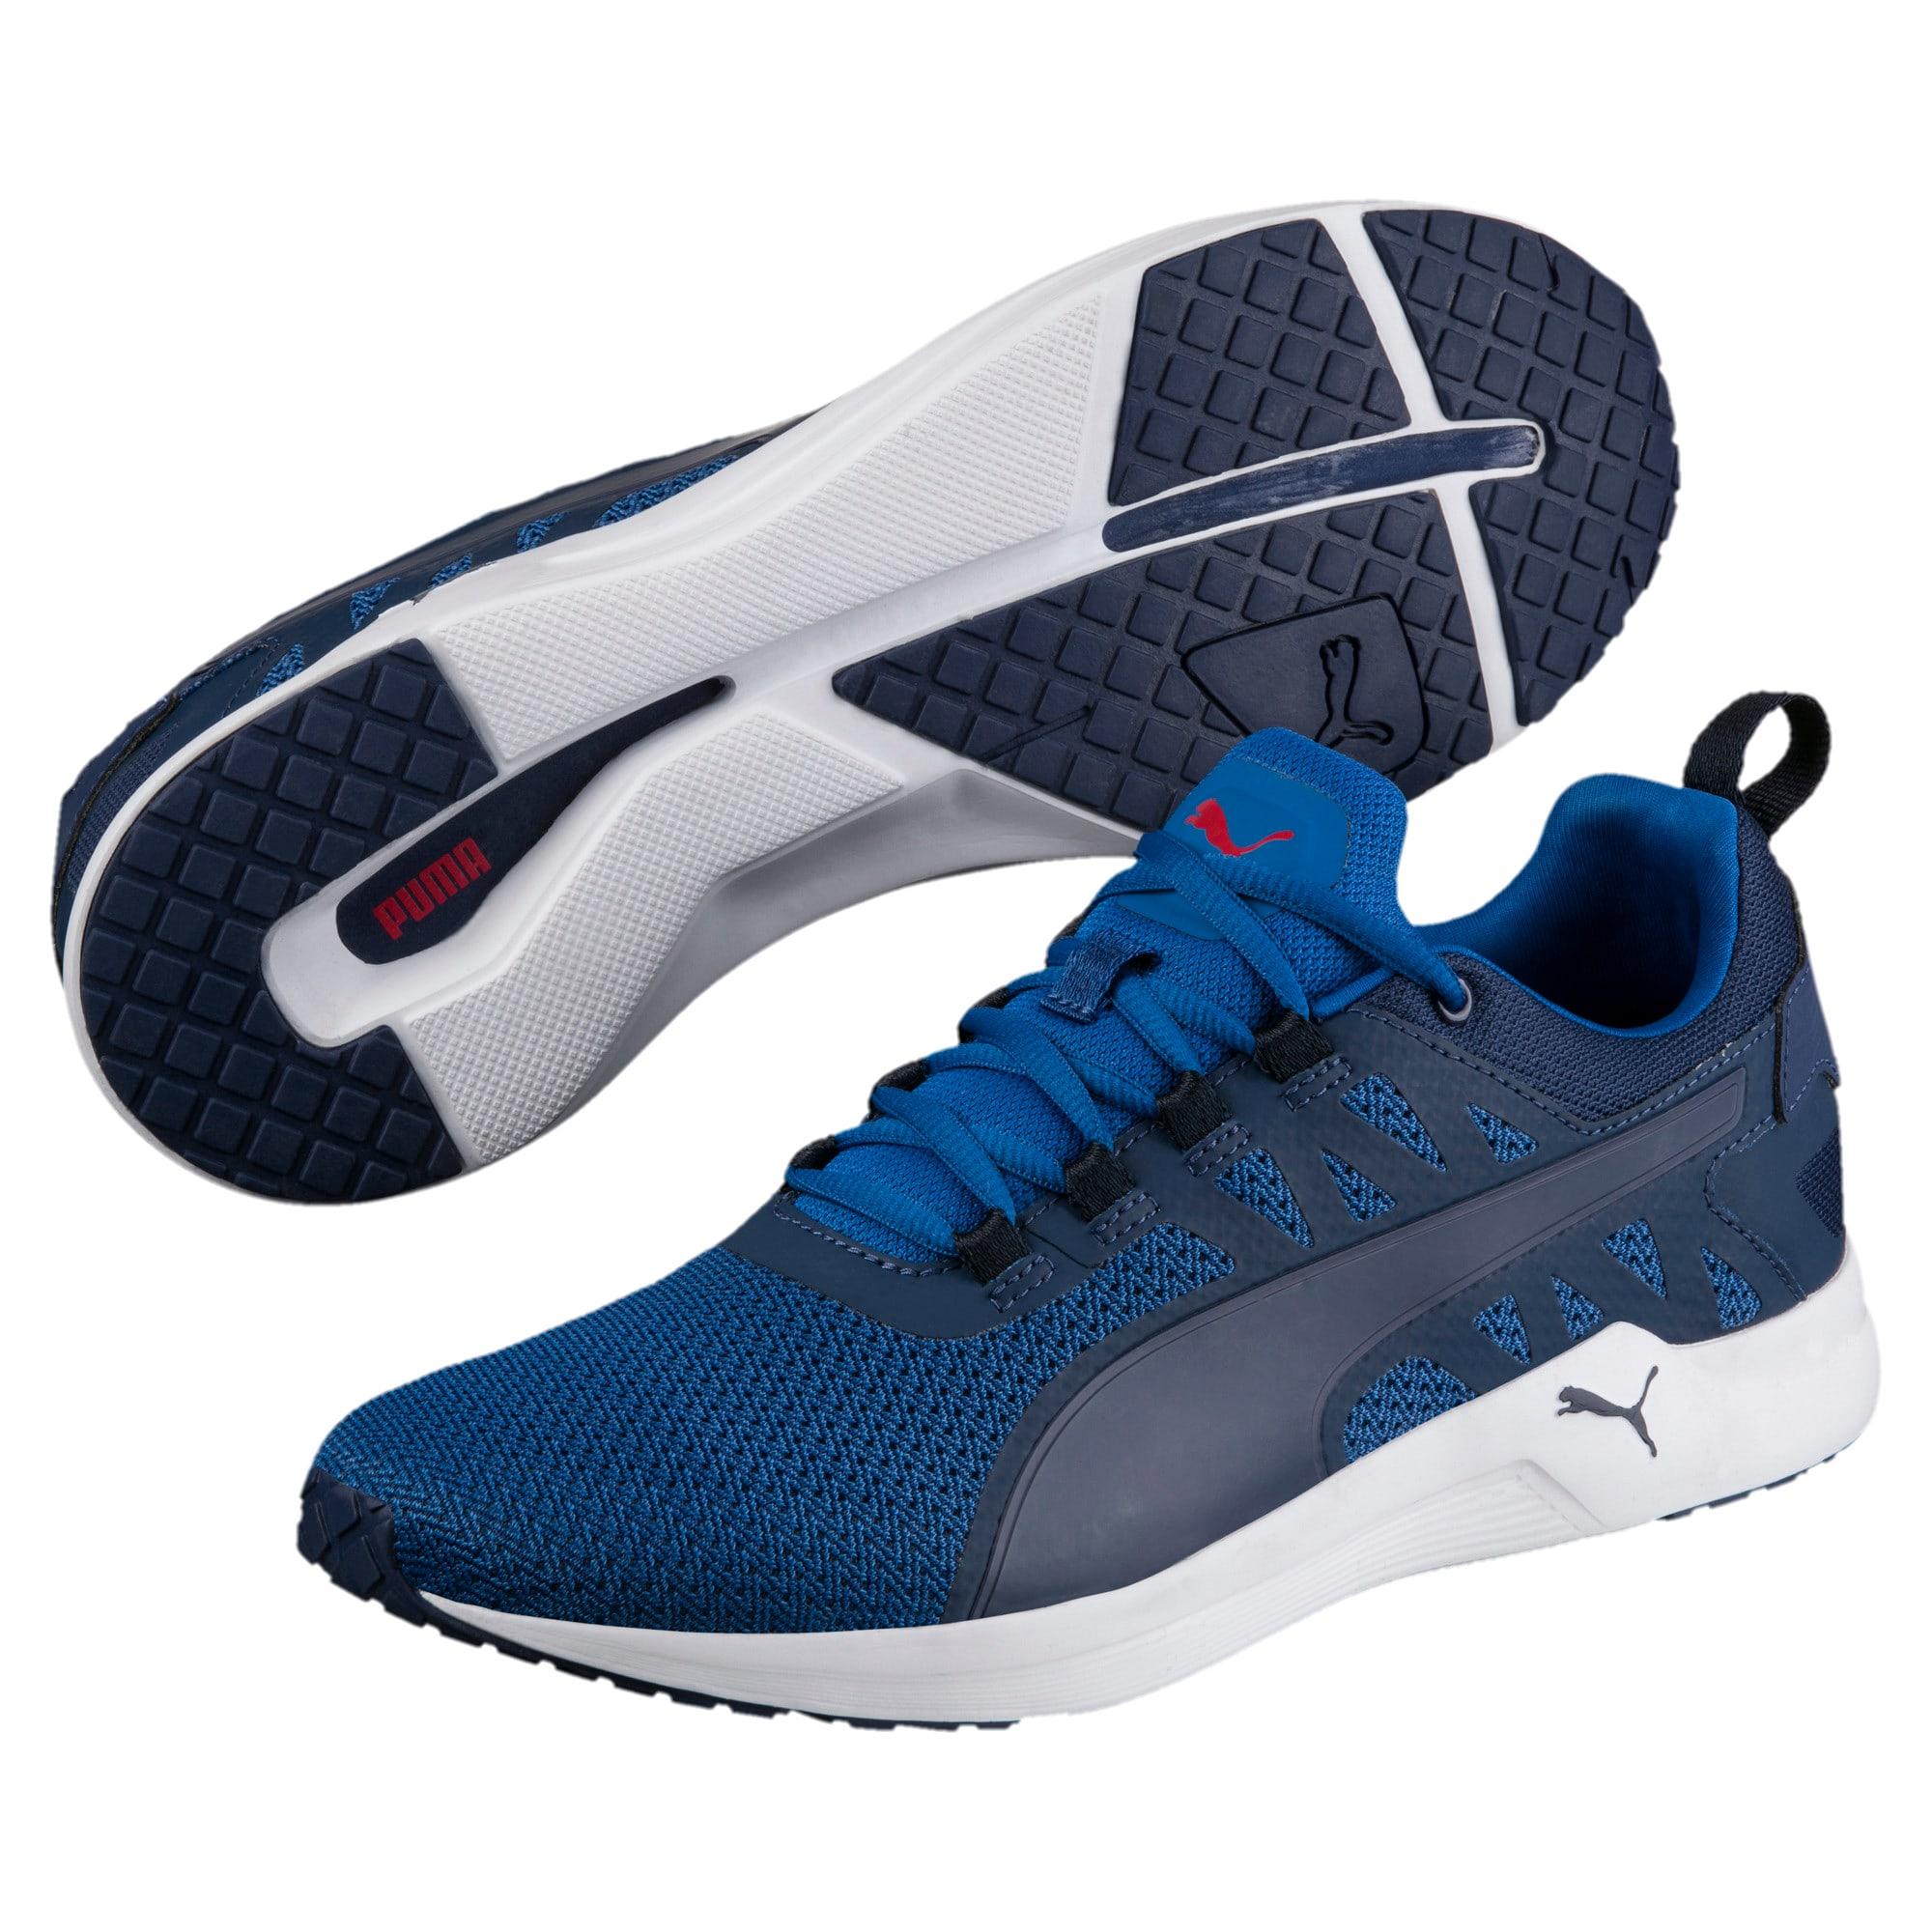 Pulse XT v2 Core Men's Training Shoes